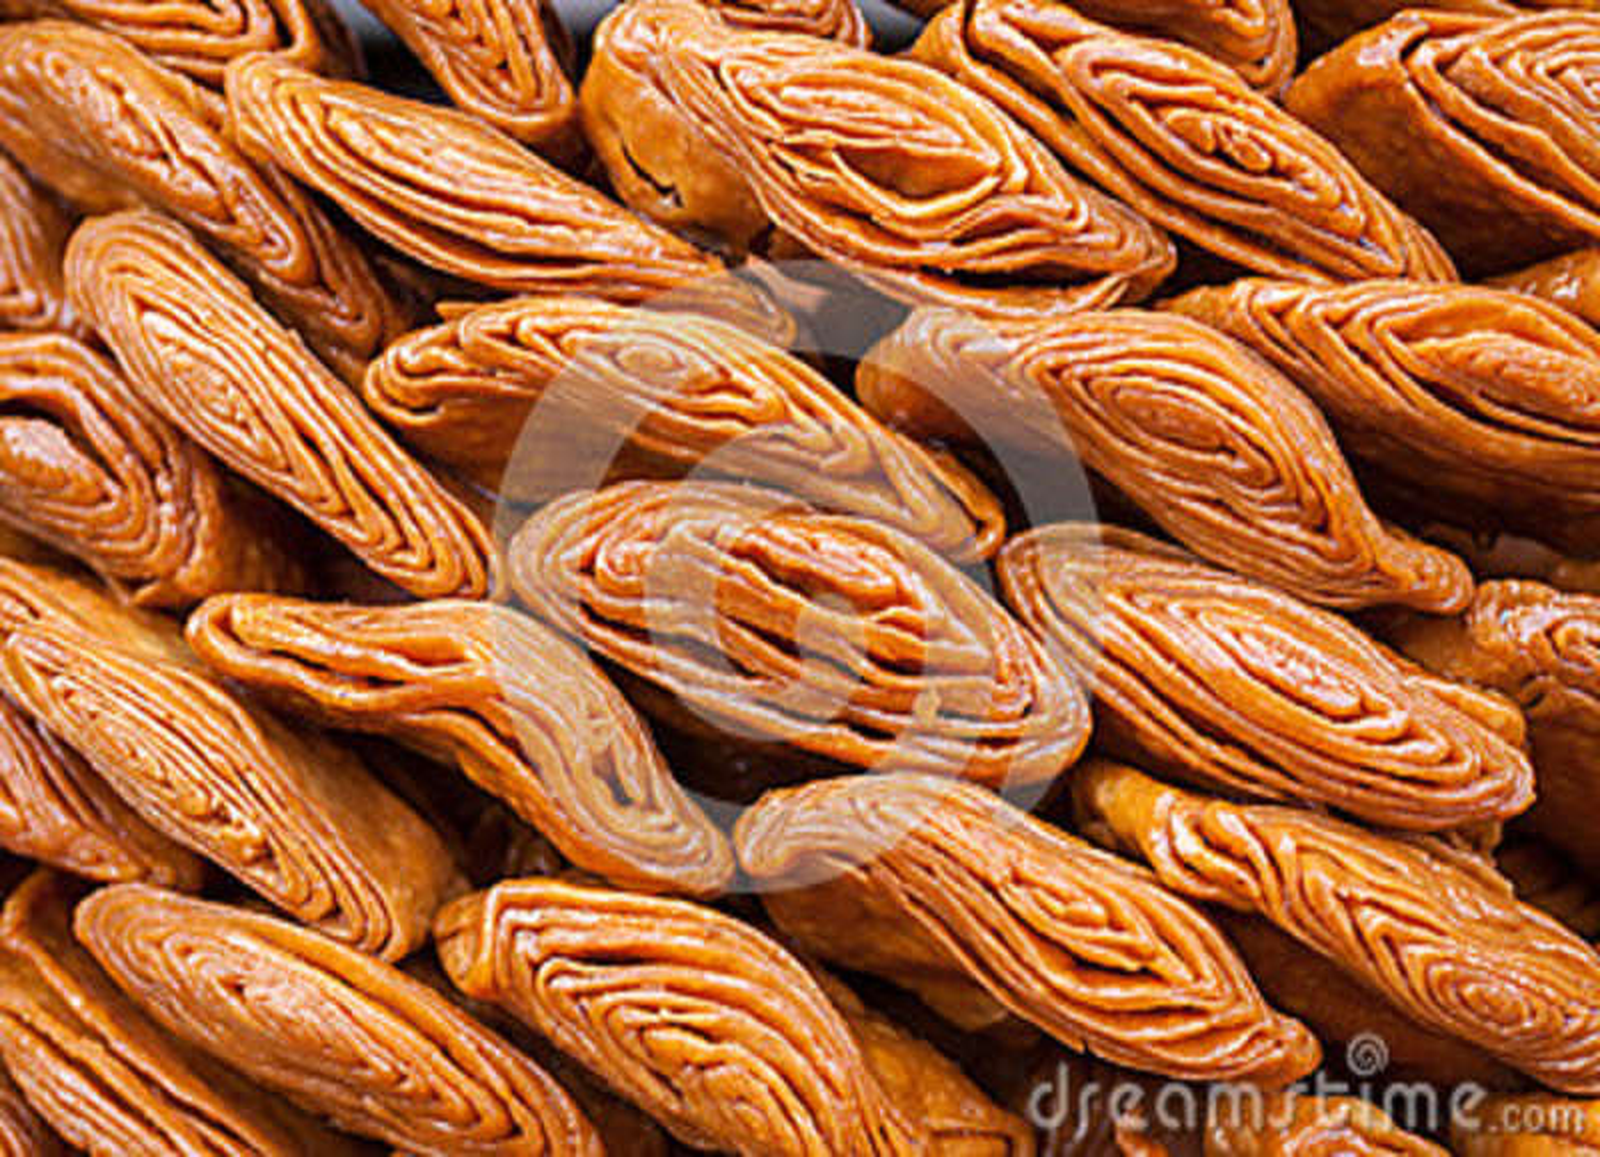 Indisch snoepje